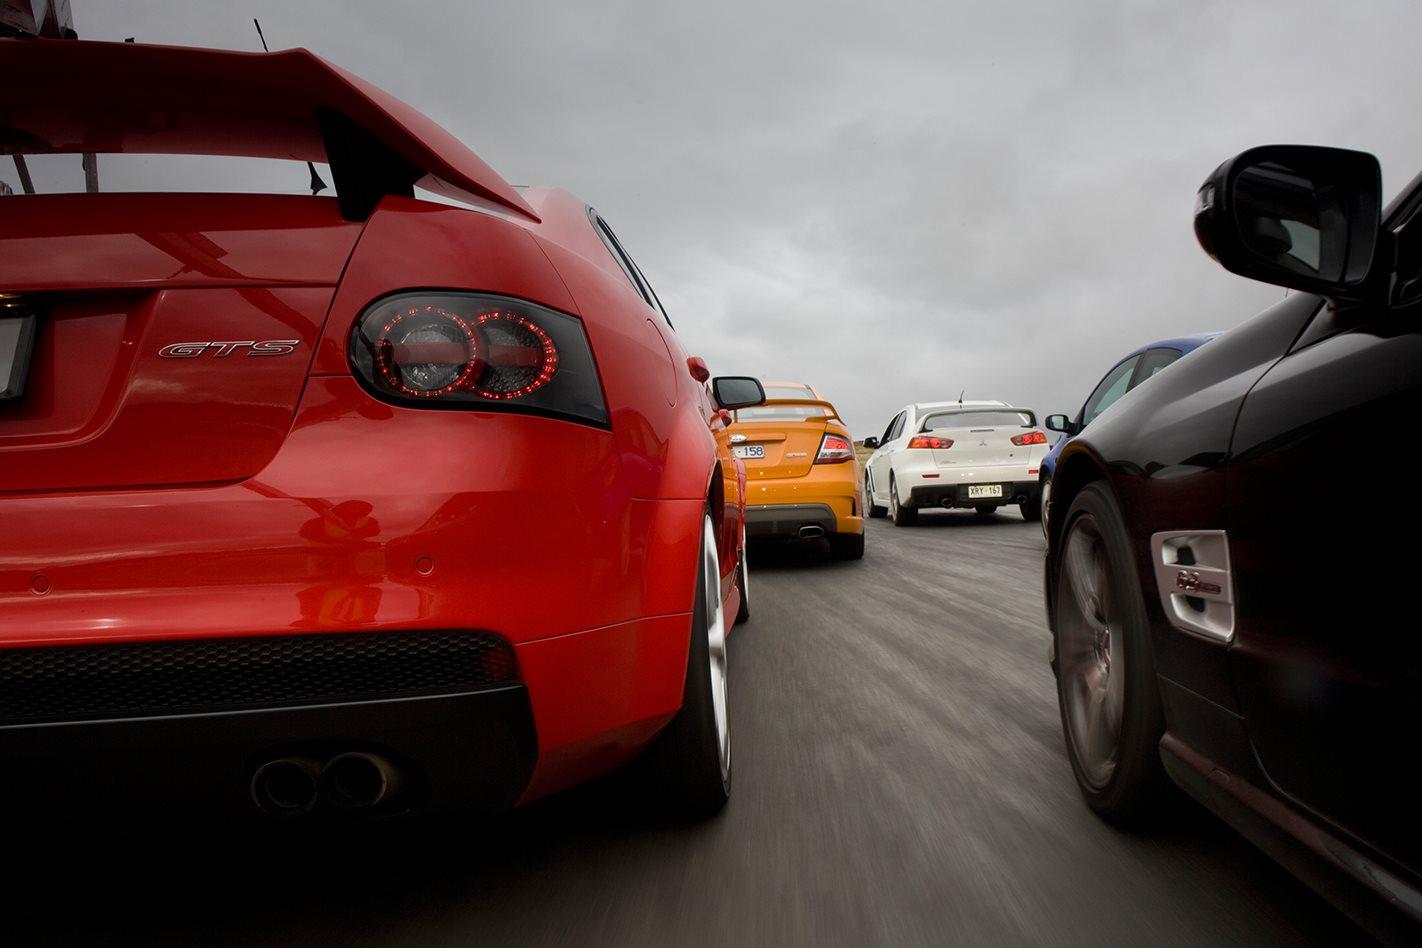 2008-HSV-GTS-rear.jpg